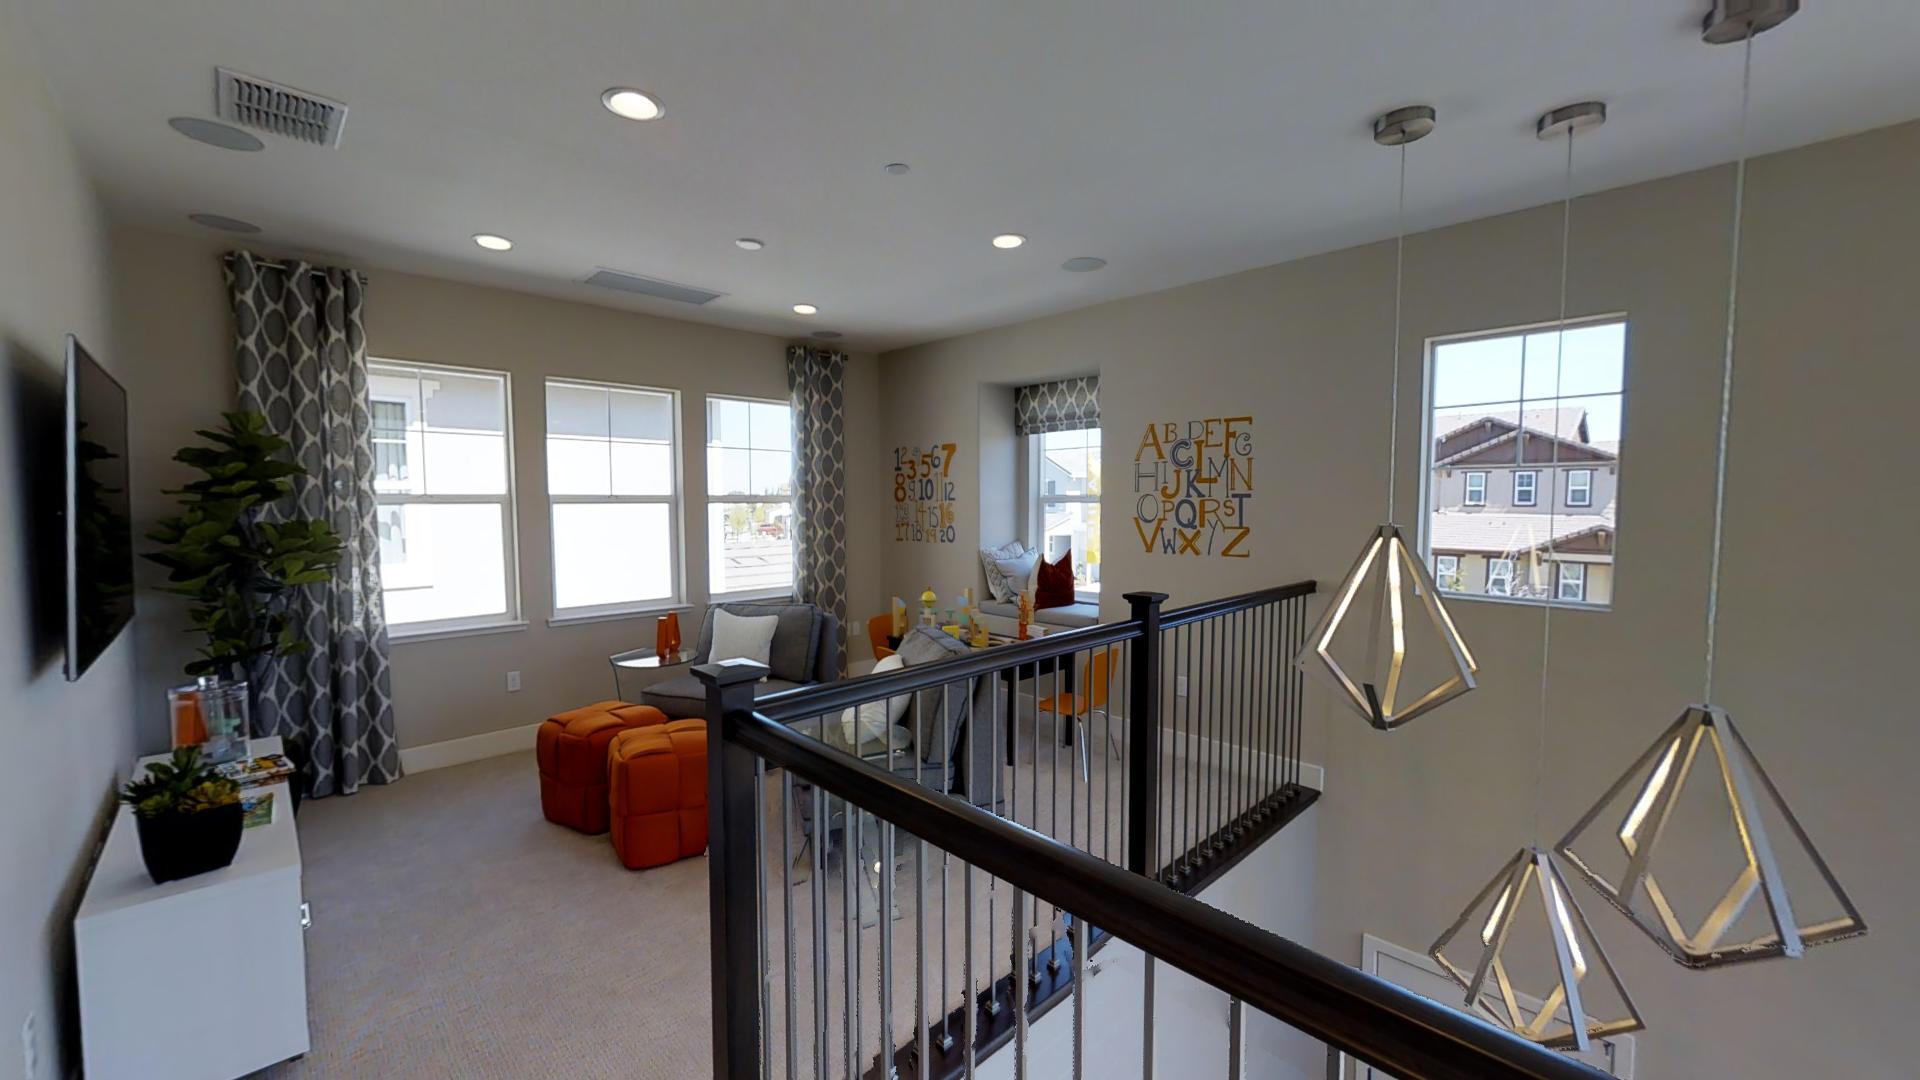 Ashford at Mountain House Plan 1 Loft